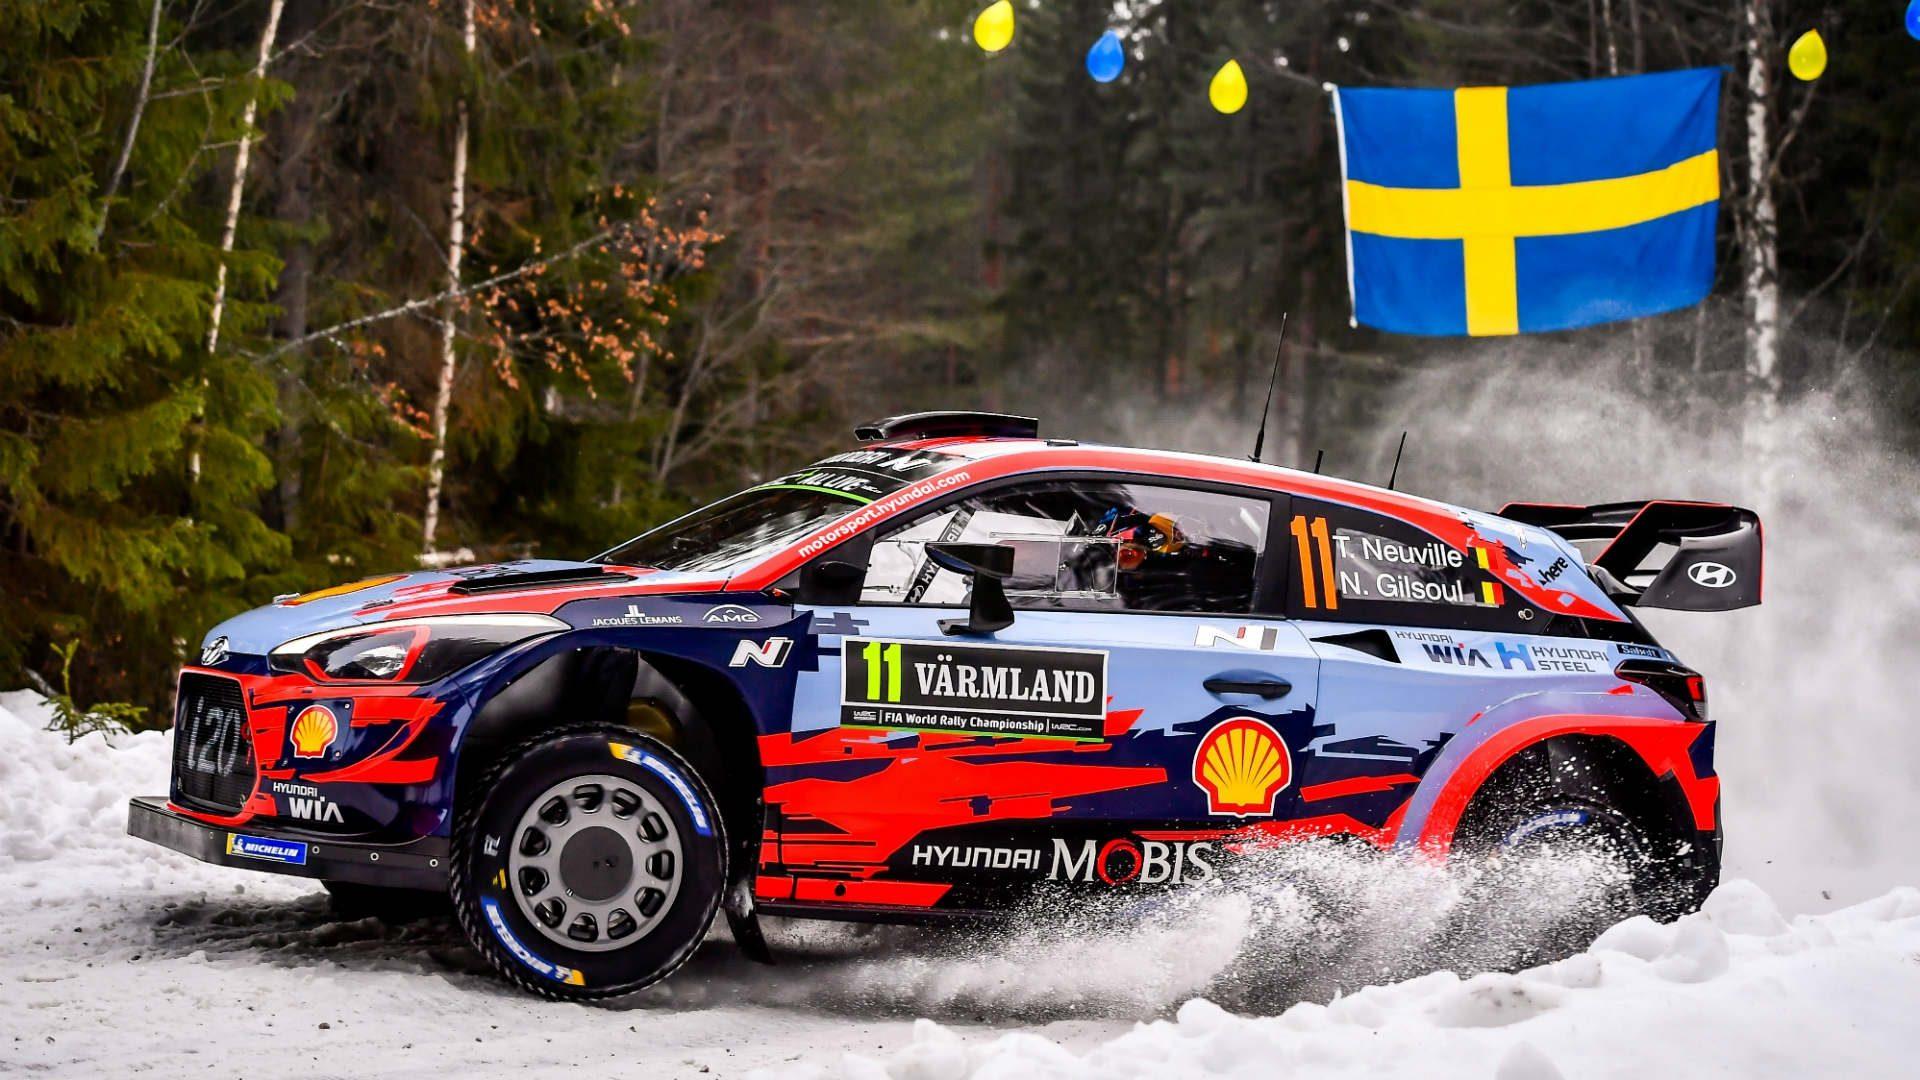 WRC Rally Sweden 2019 – Actiunea se muta pe zapada